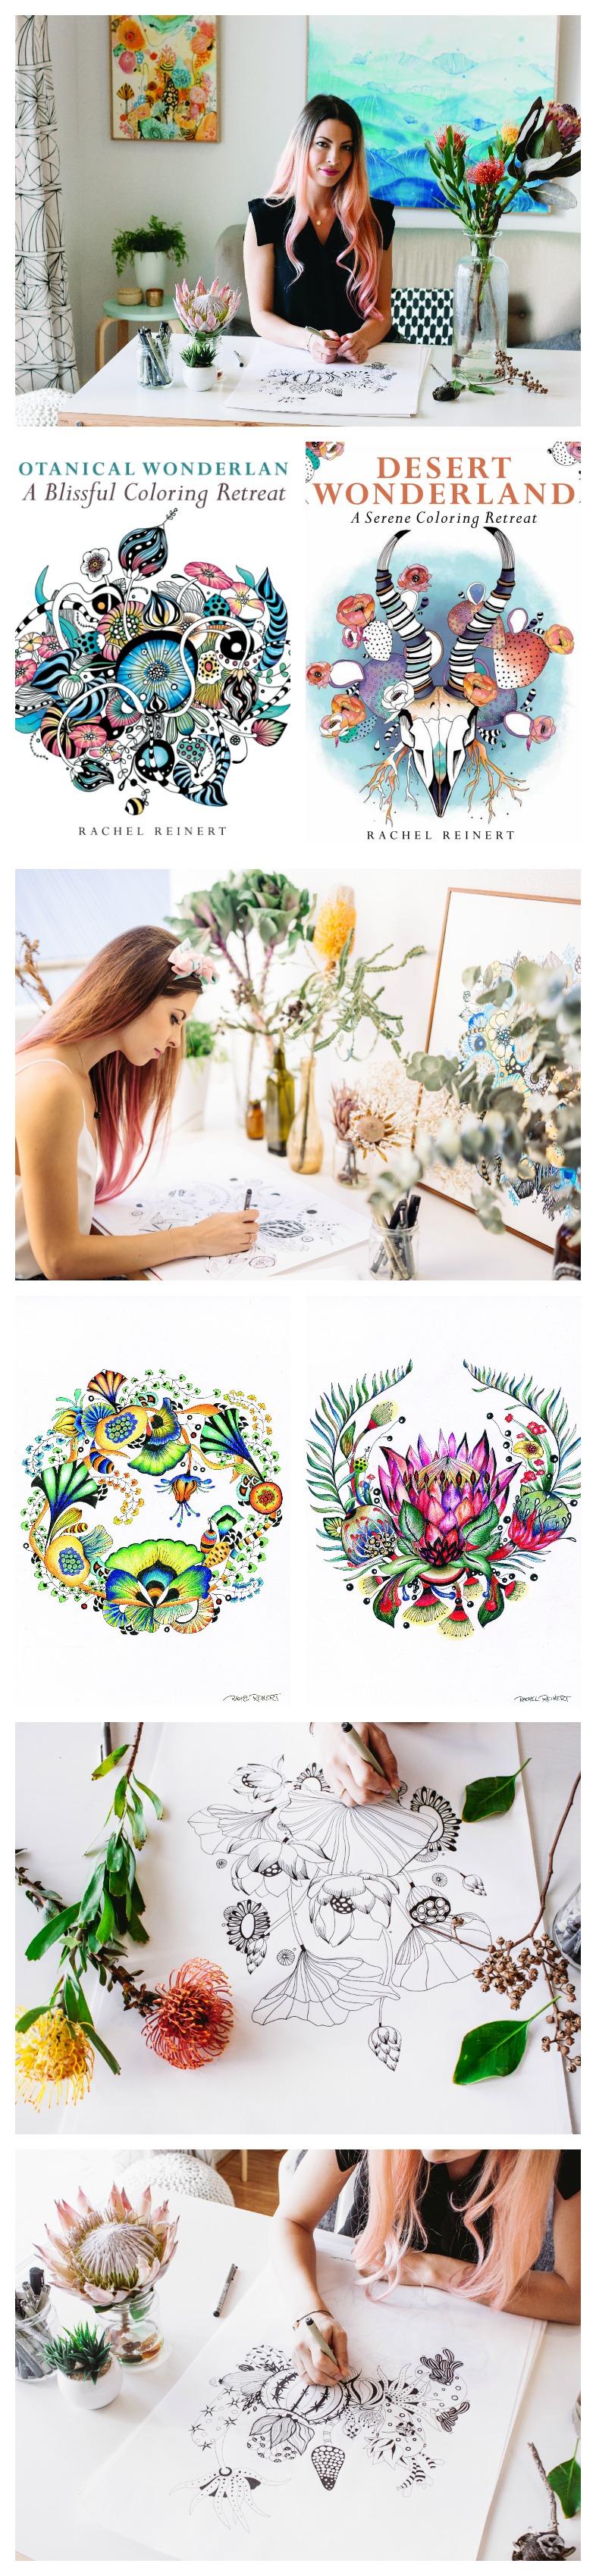 Book color illustrator - Illustrator Of The Popular Adult Coloring Book Botanical Wonderland Rachel Reinert Talks To Us